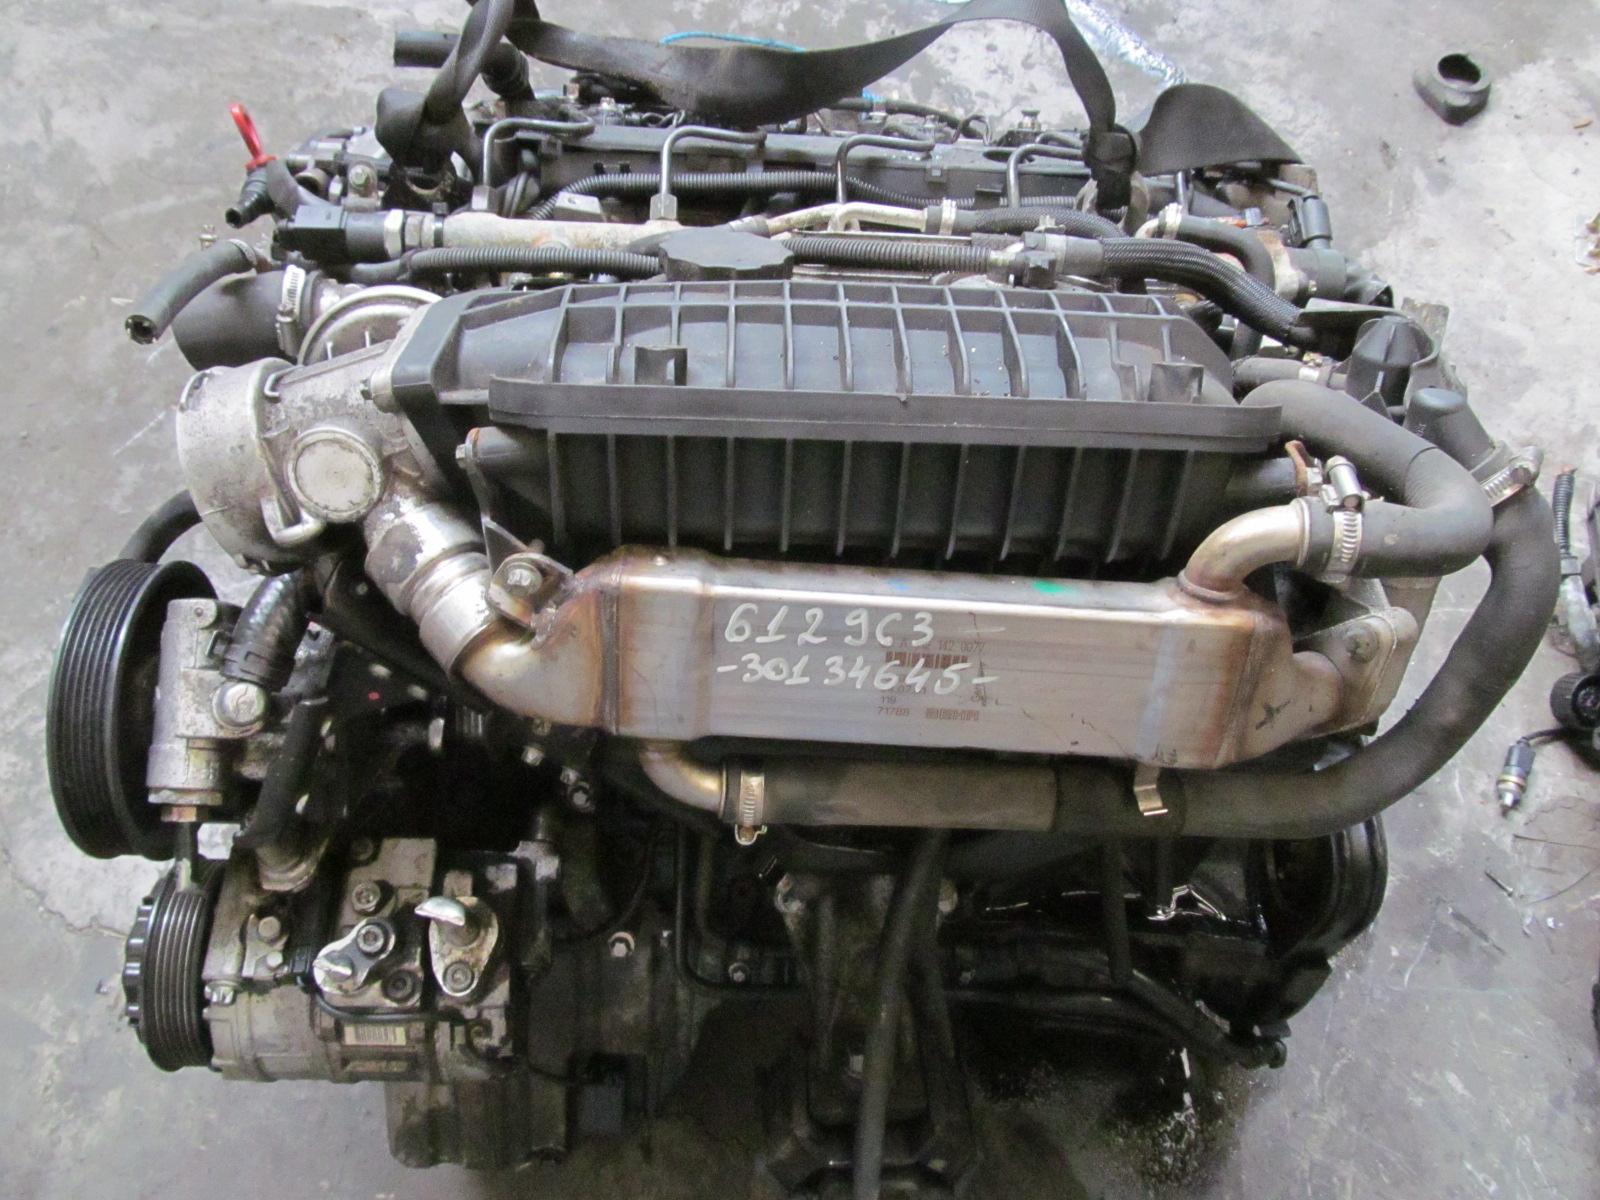 Motor - Mercedes-Benz ML270 2.7CDI 2005 Diesel ...